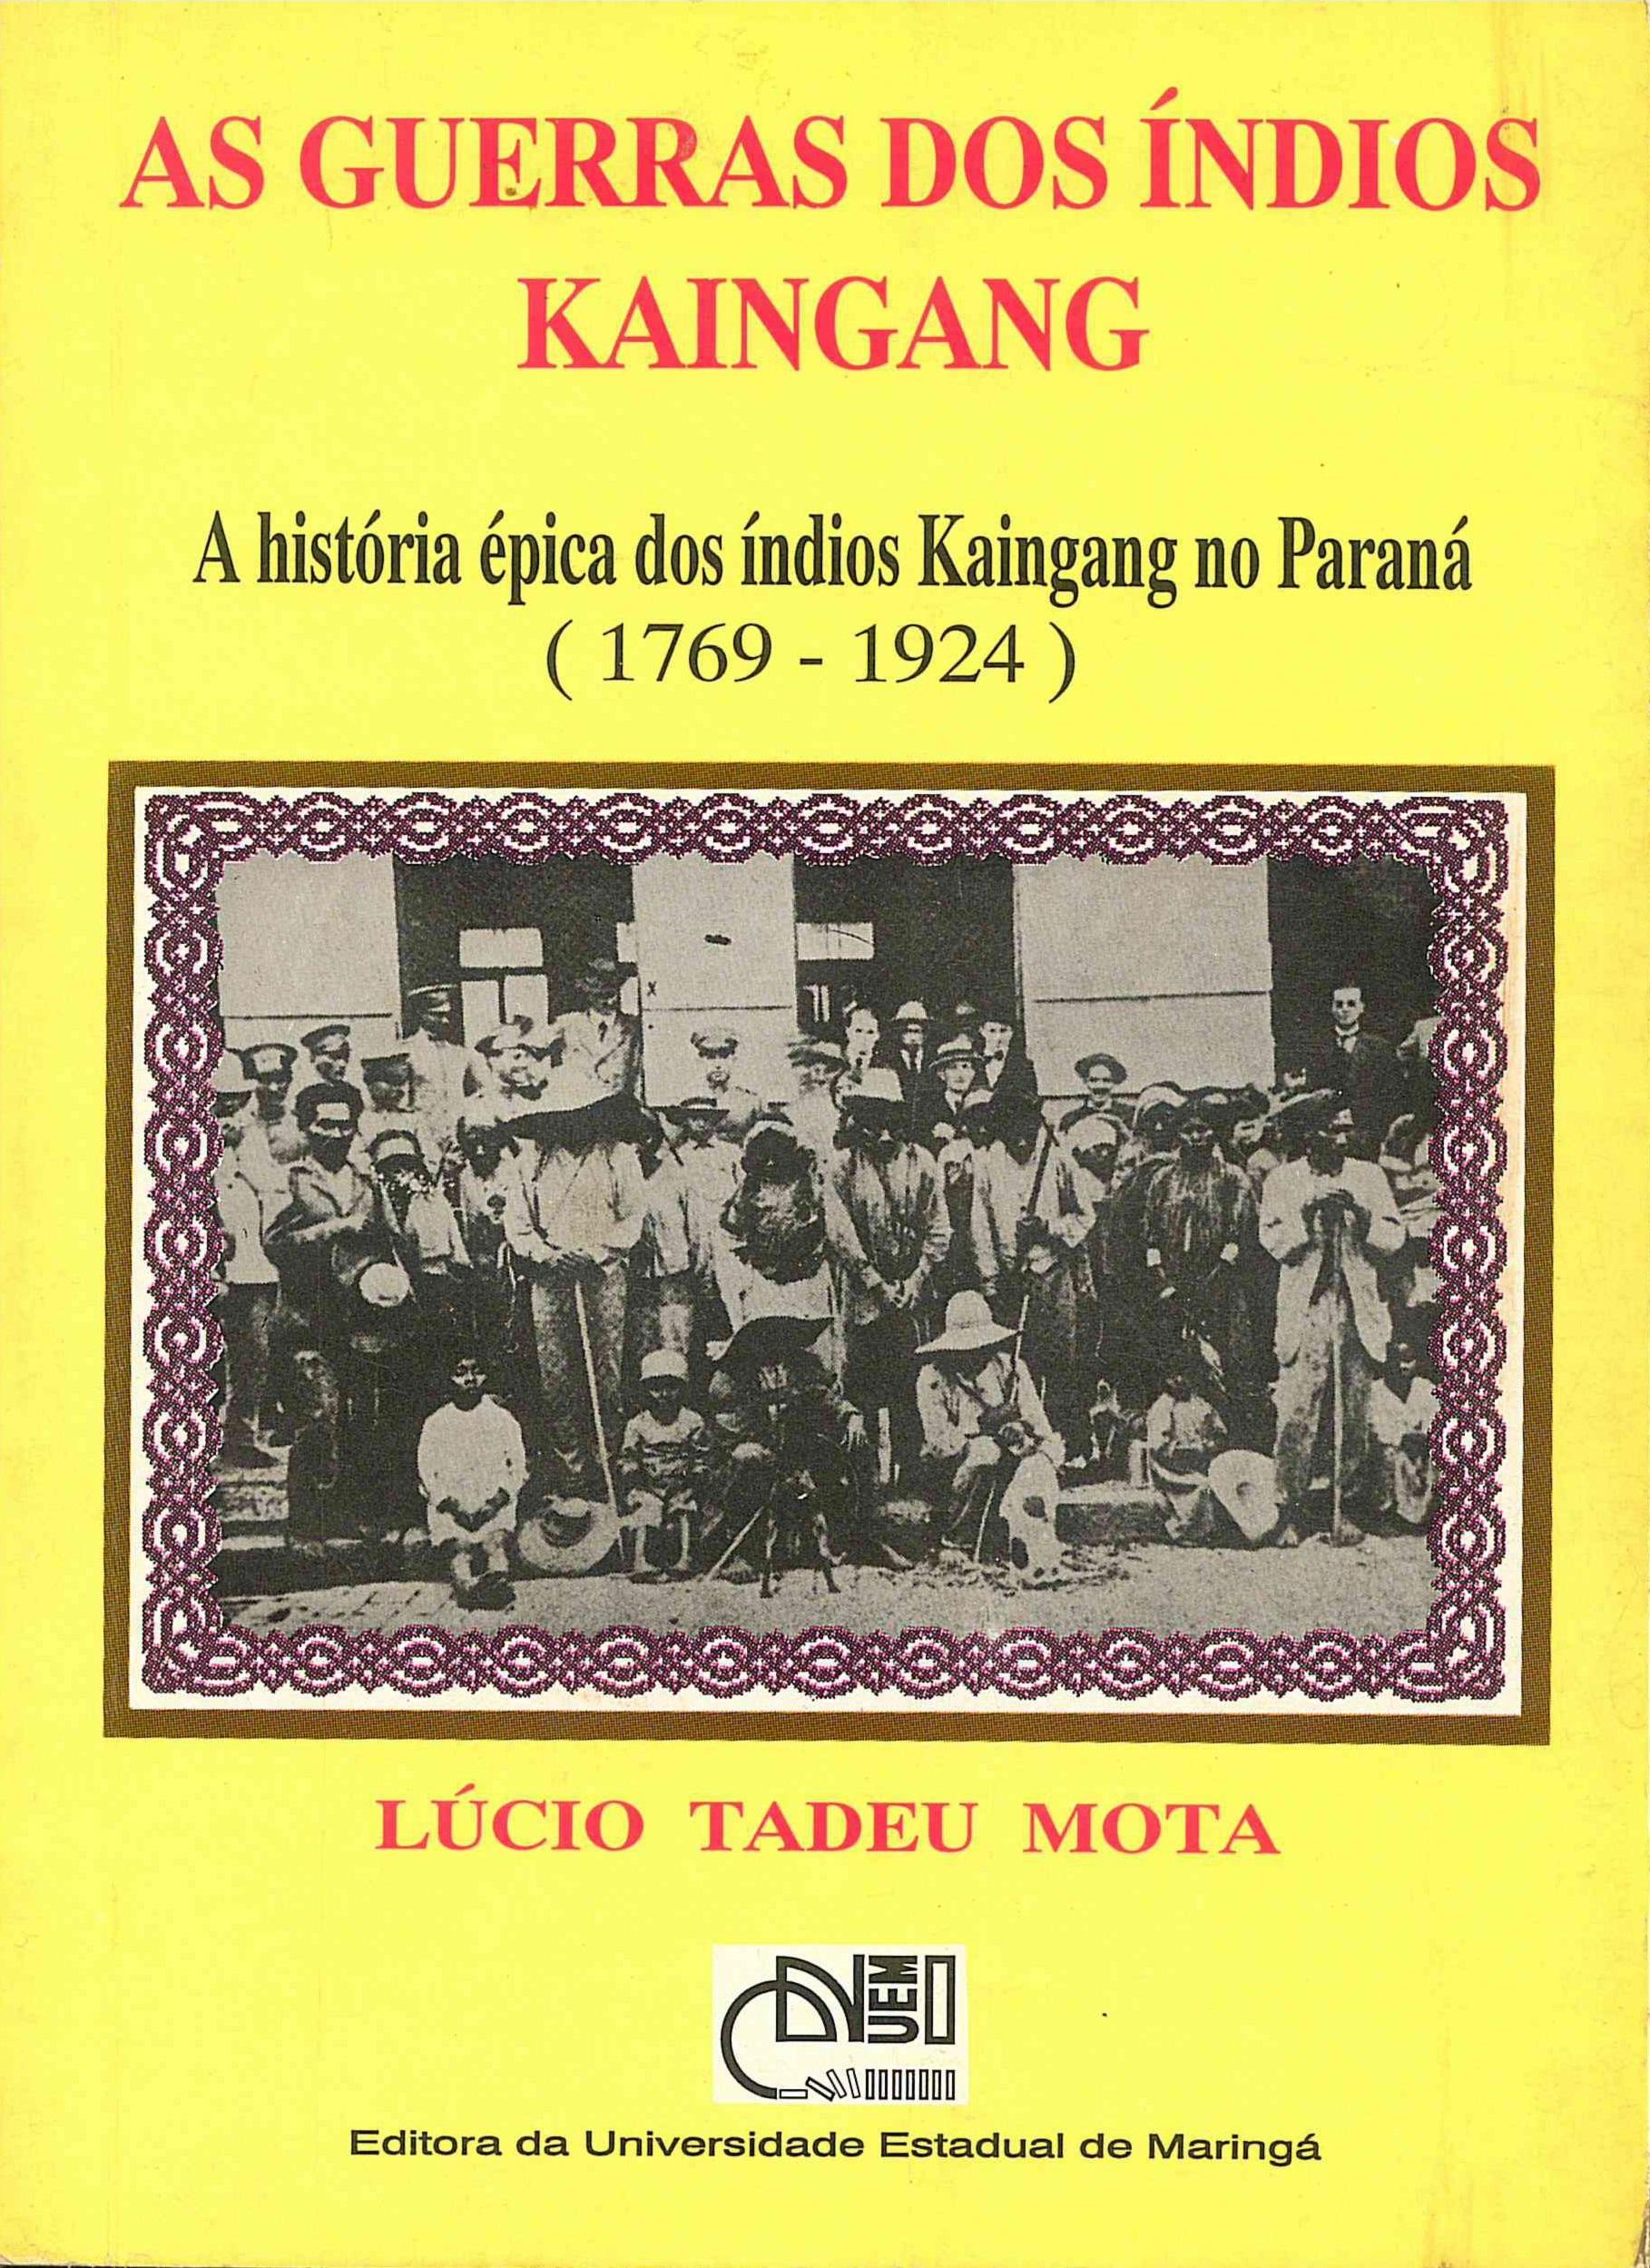 Guerras dos índios Kaingang: a história épica dos índios Kaingang no Paraná (1769-1924)